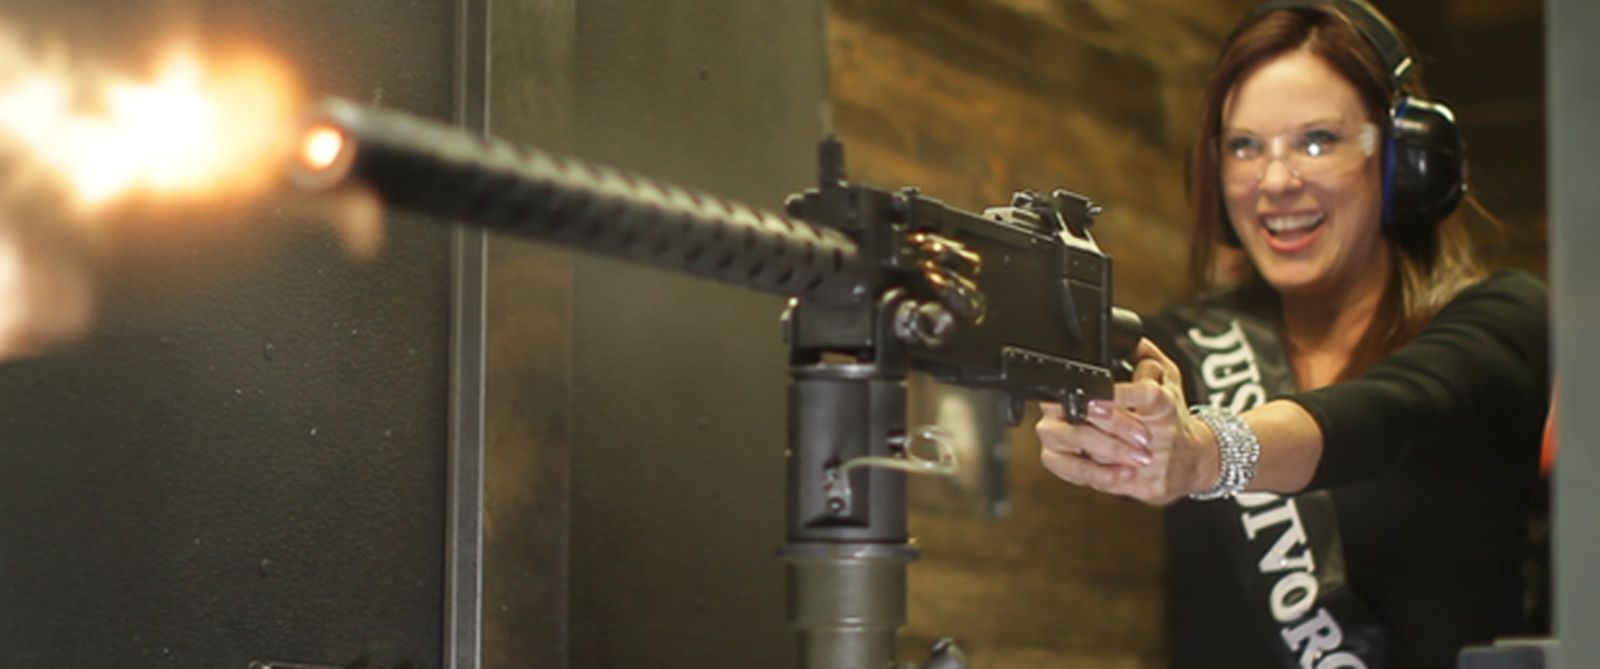 shoot machine guns vegas